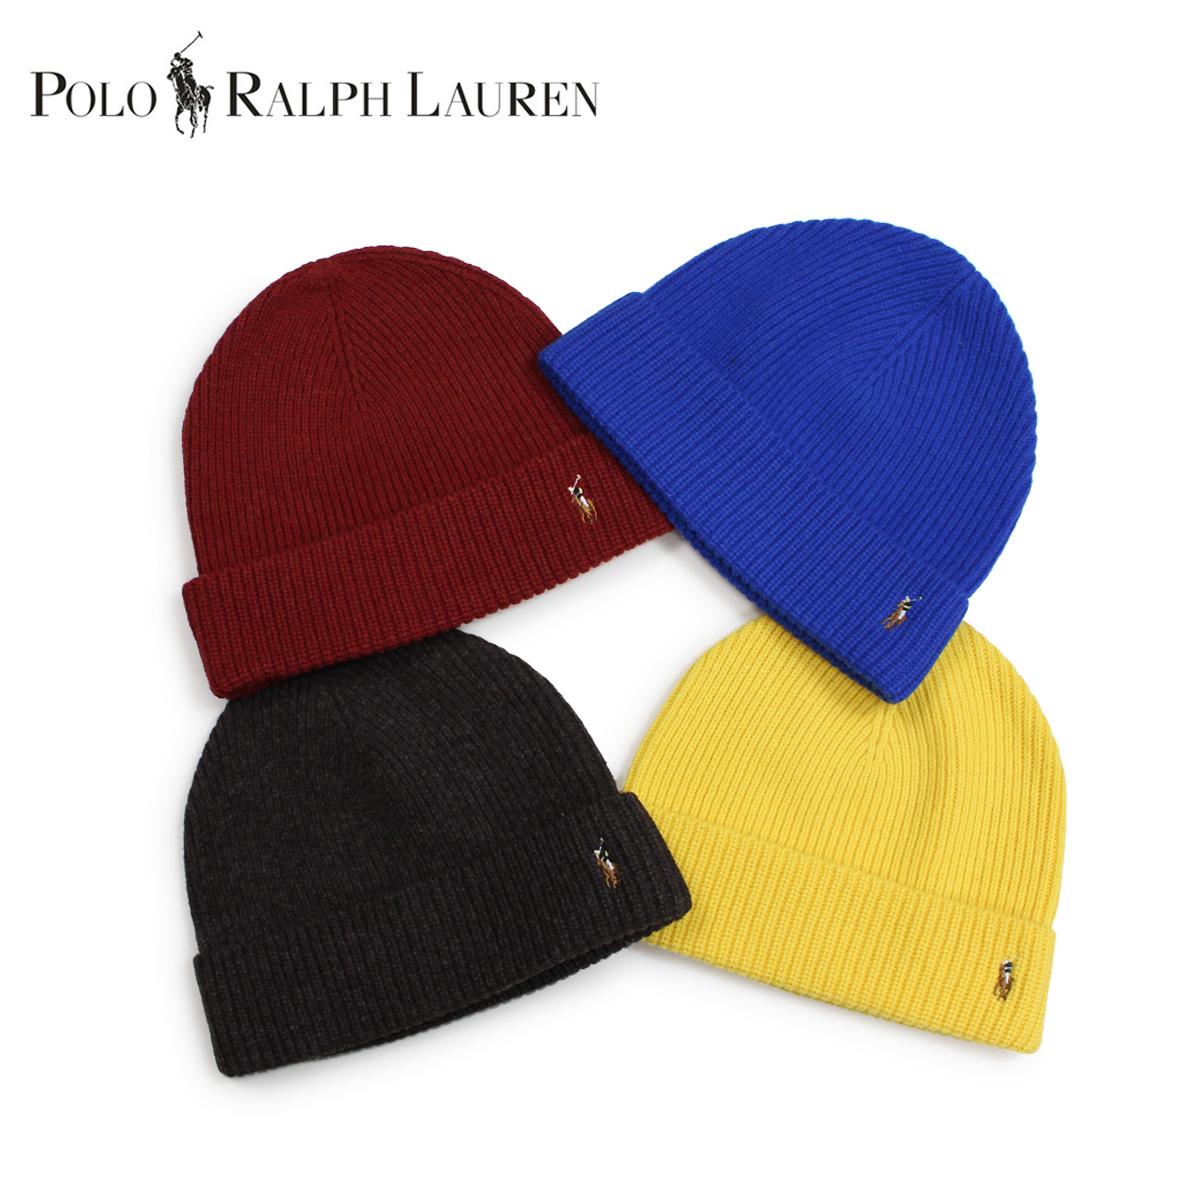 cc62d722b4f POLO RALPH LAUREN polo Ralph Lauren knit hat knit cap beanie men gap Dis  merino wool SIGNATURE MERINO CUFF HAT 6F0101  1 10 Shinnyu load